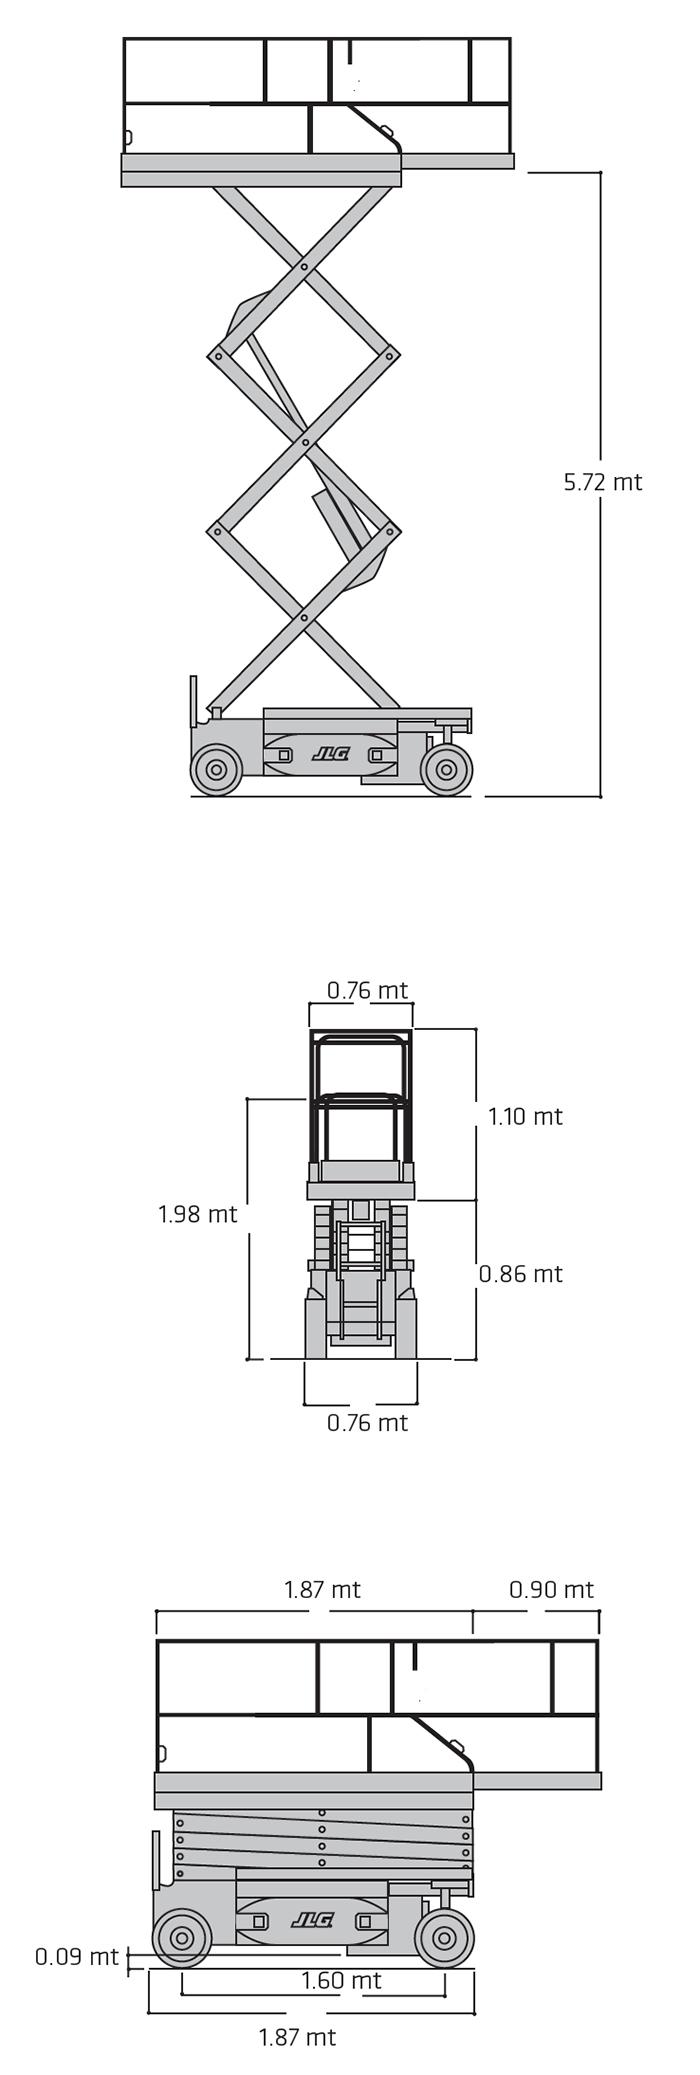 Piattaforma Semovente Verticale Elettrica VE 8 JL - 1930 ES